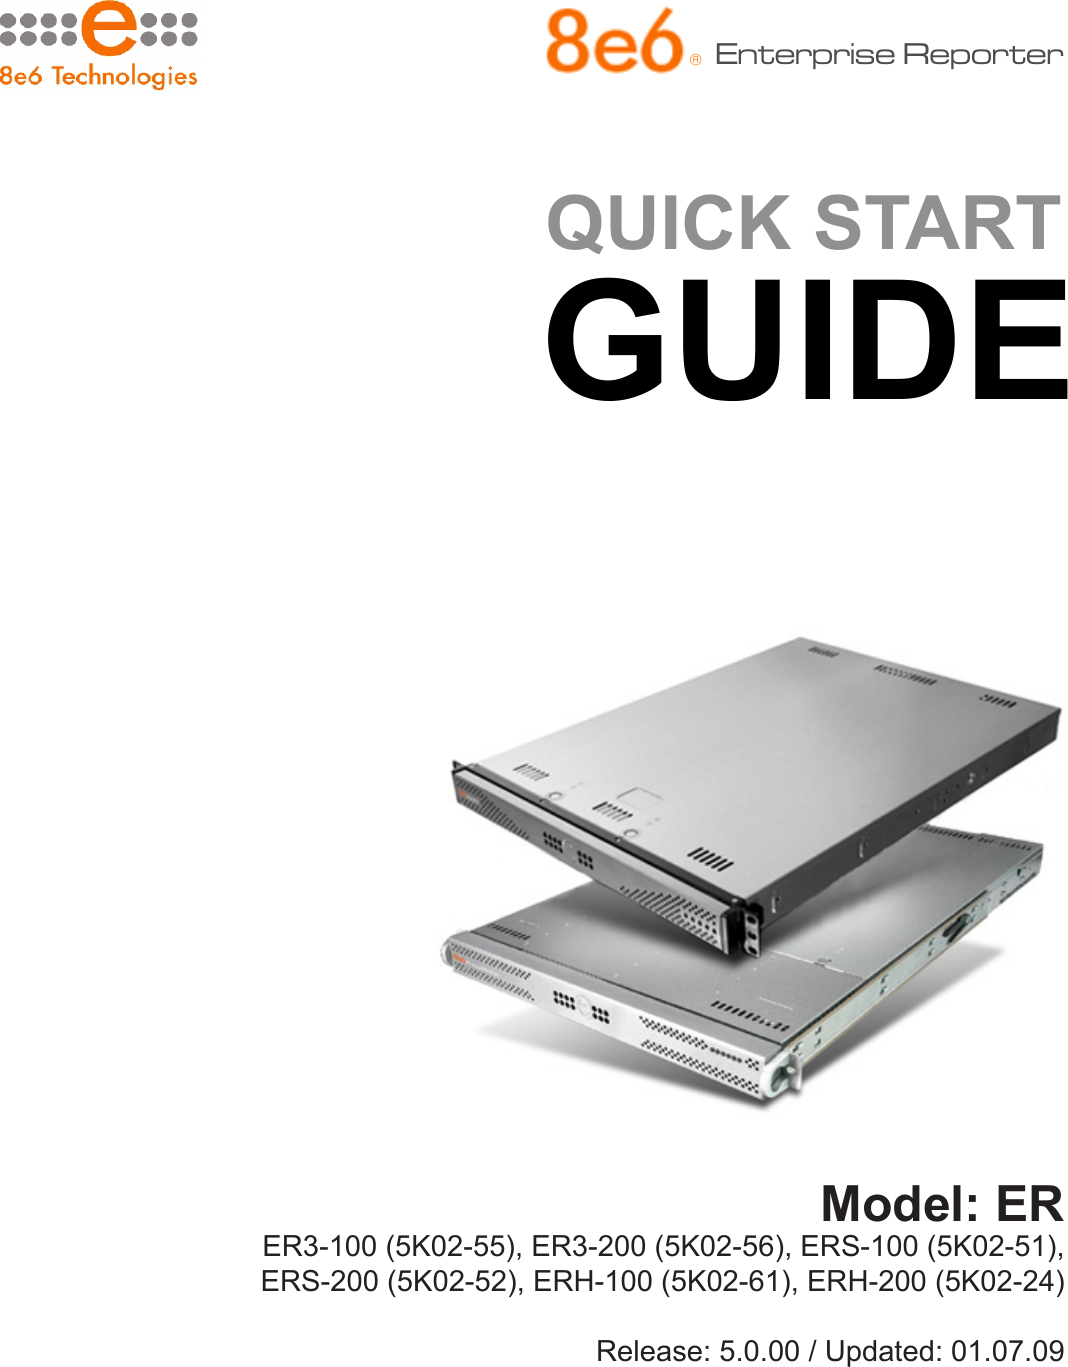 8E6 Technologies Erh 200 5K02 24 Owners Manual Enterprise Reporter Quick Start Guide